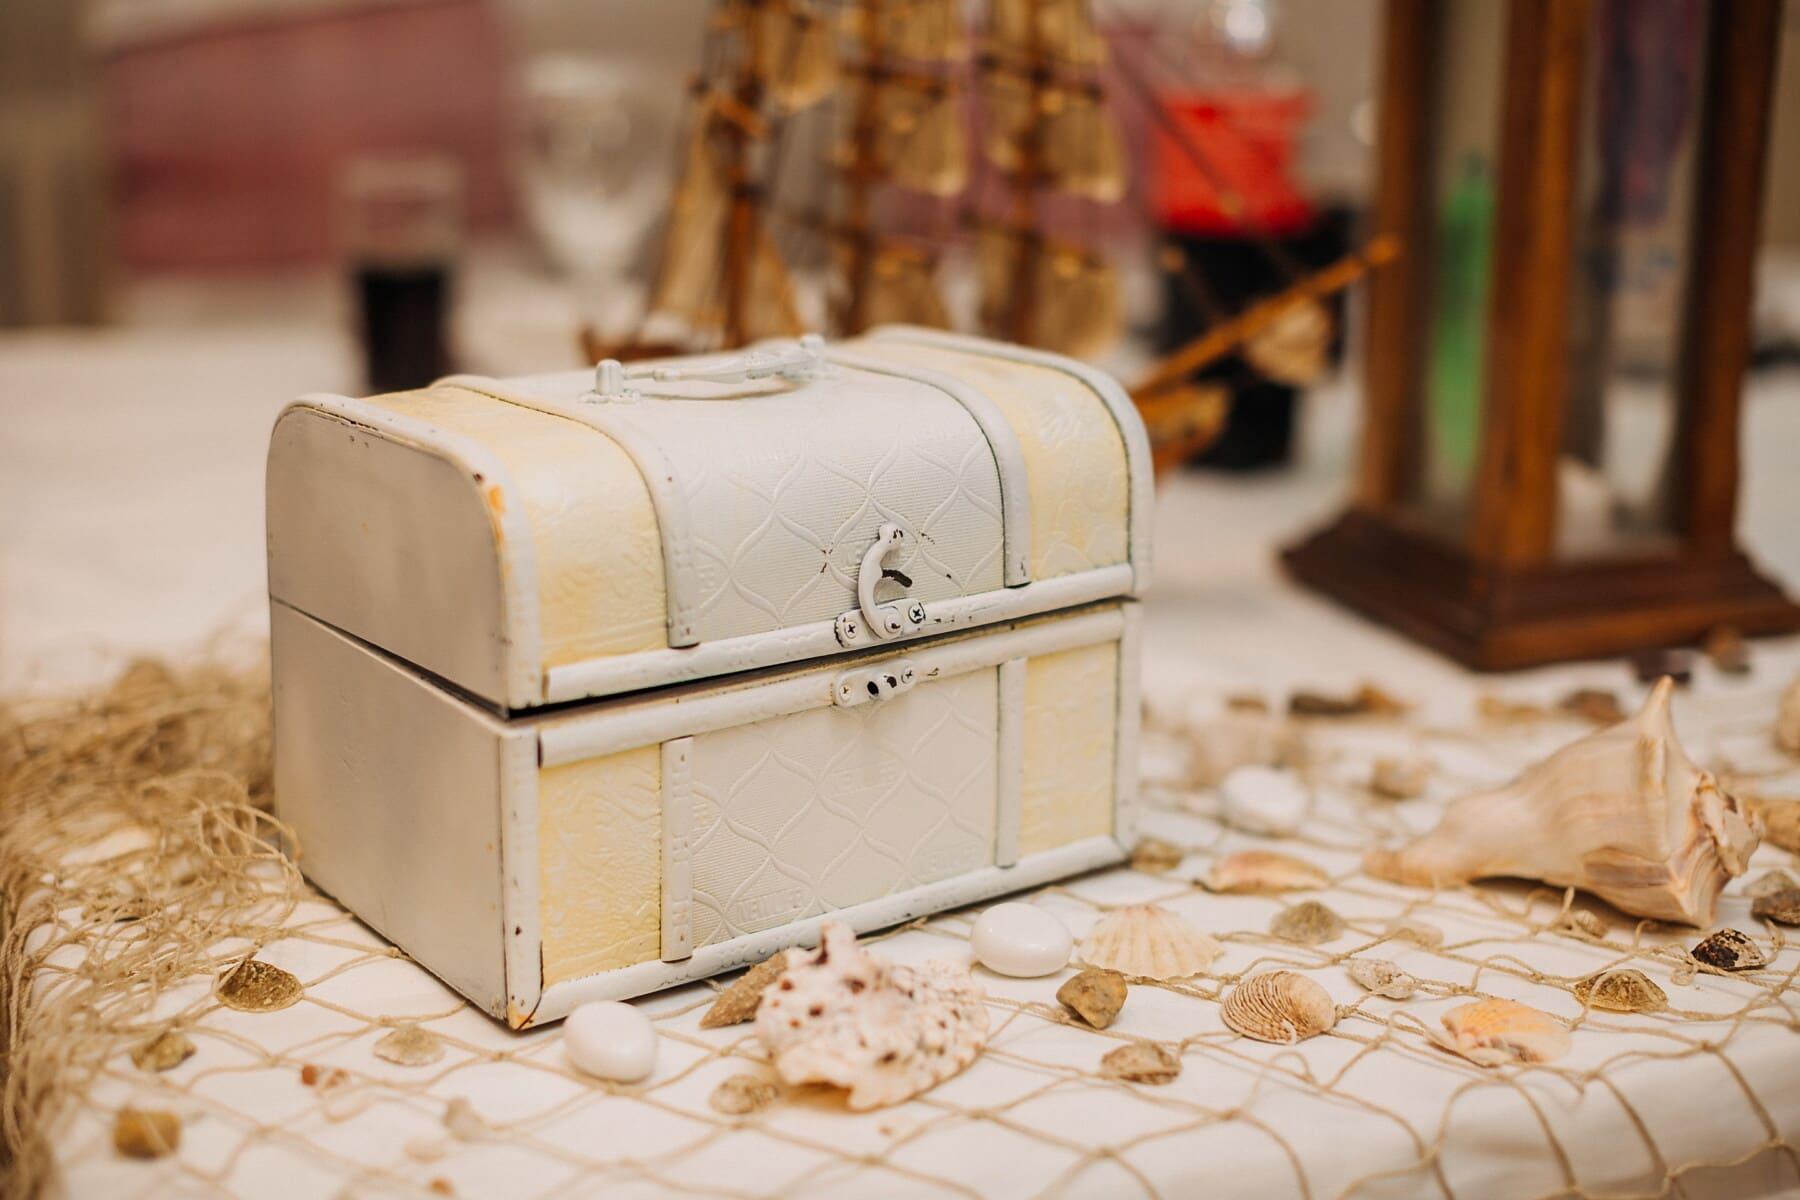 box, chest, vintage, interior decoration, seashell, treasure, luggage, container, retro, wood